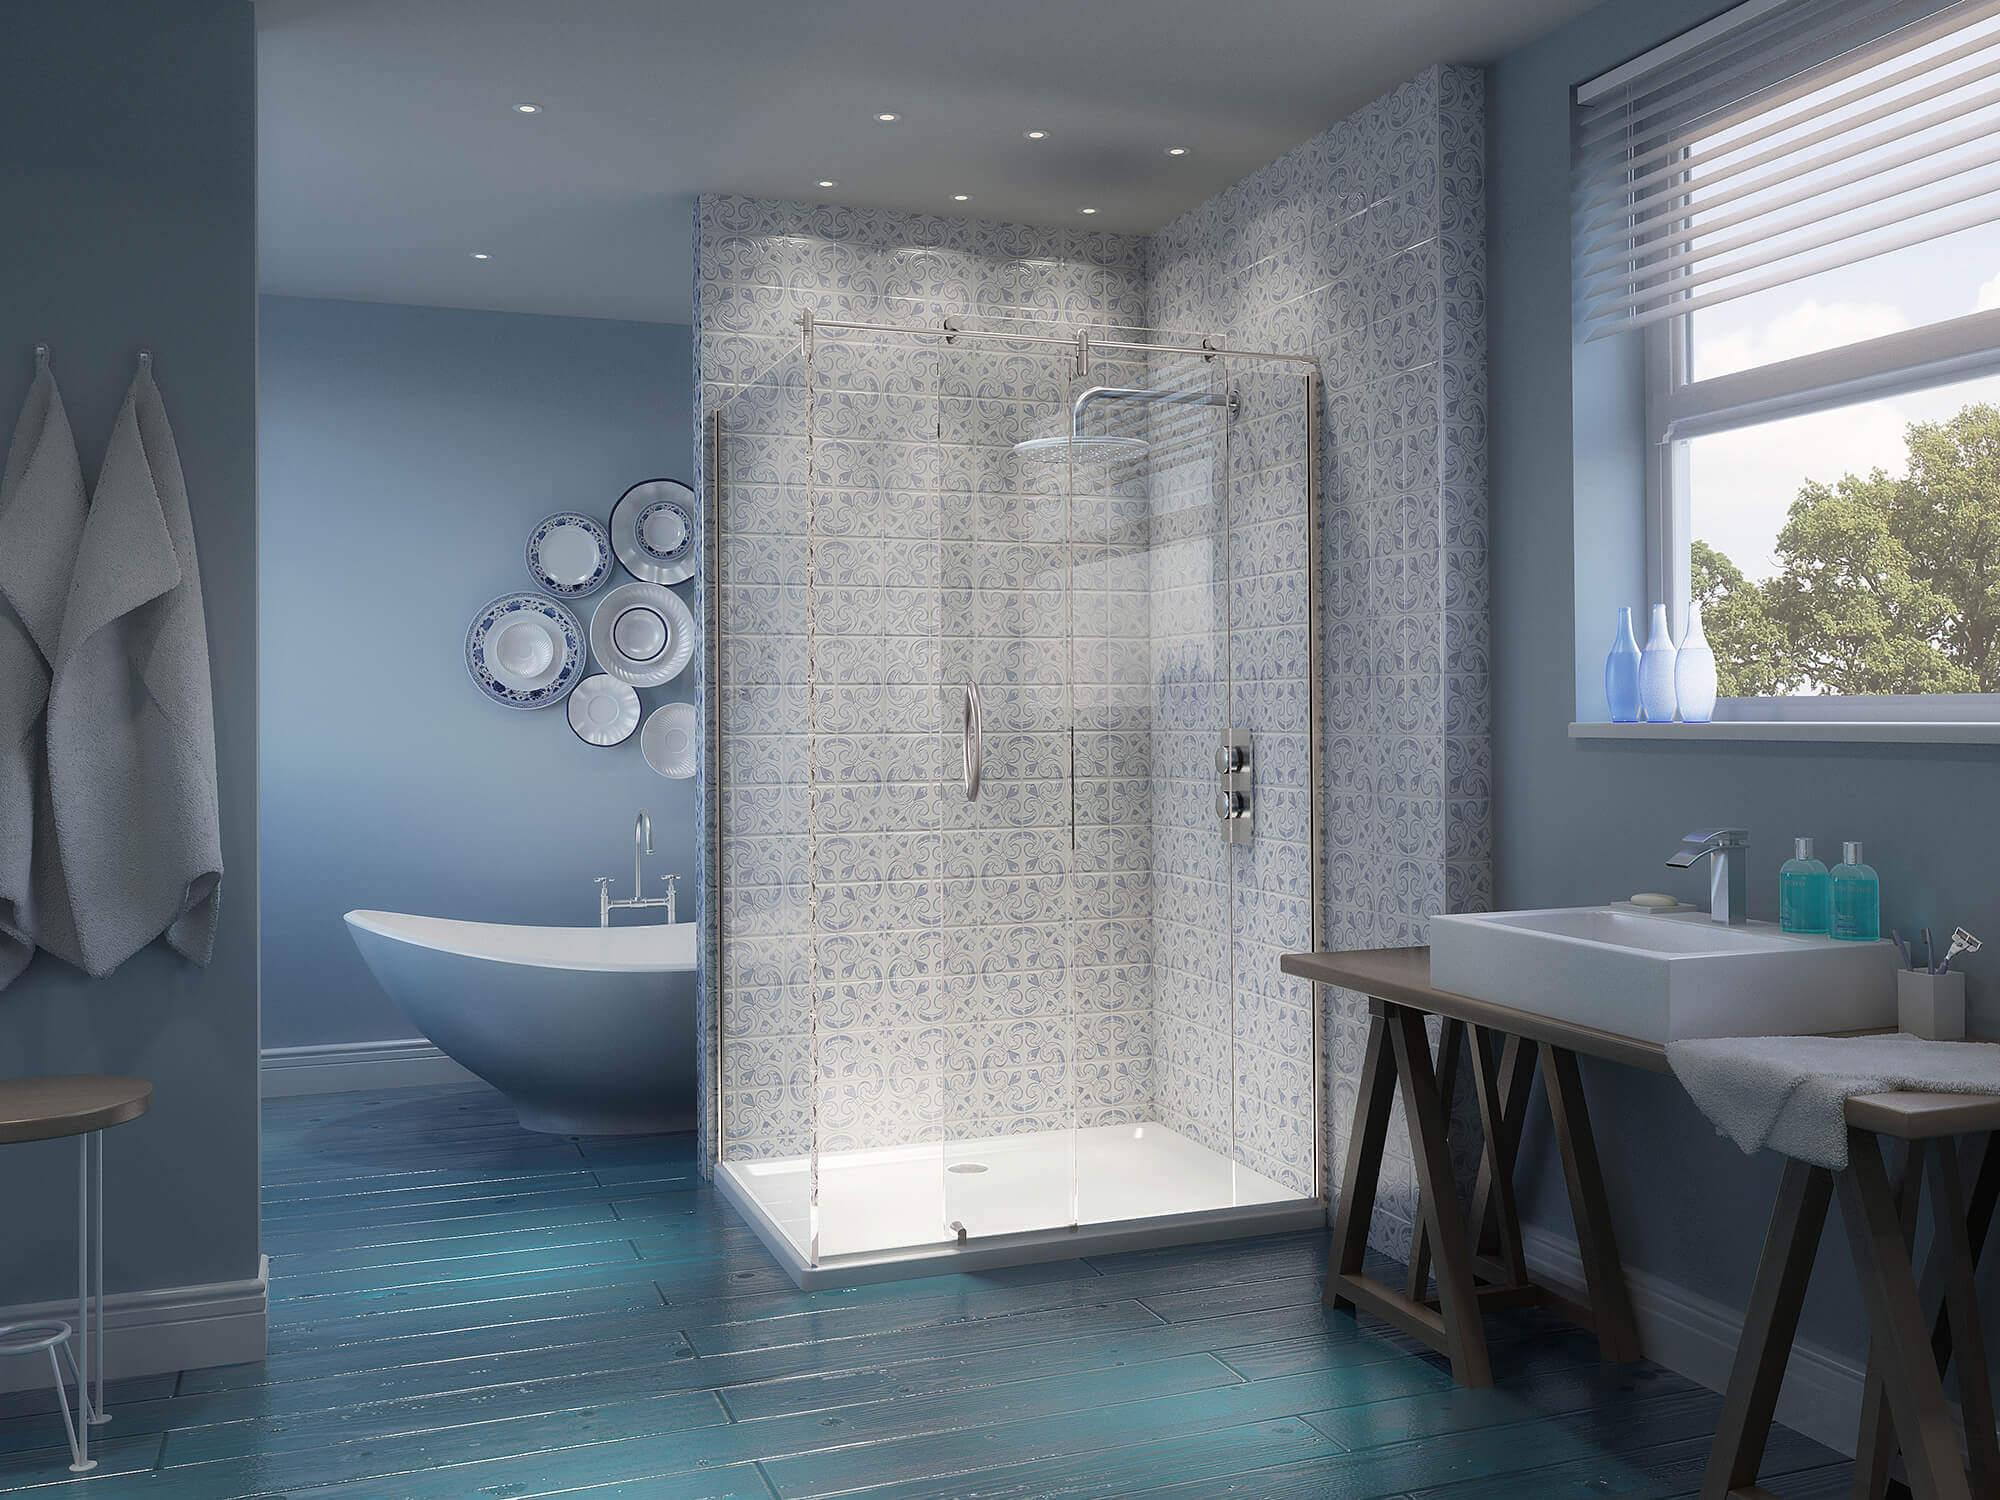 WHITE CROW STUDIOS - CORAM SHOWERS - THE BEACH HUT -BATHROOM CGIB